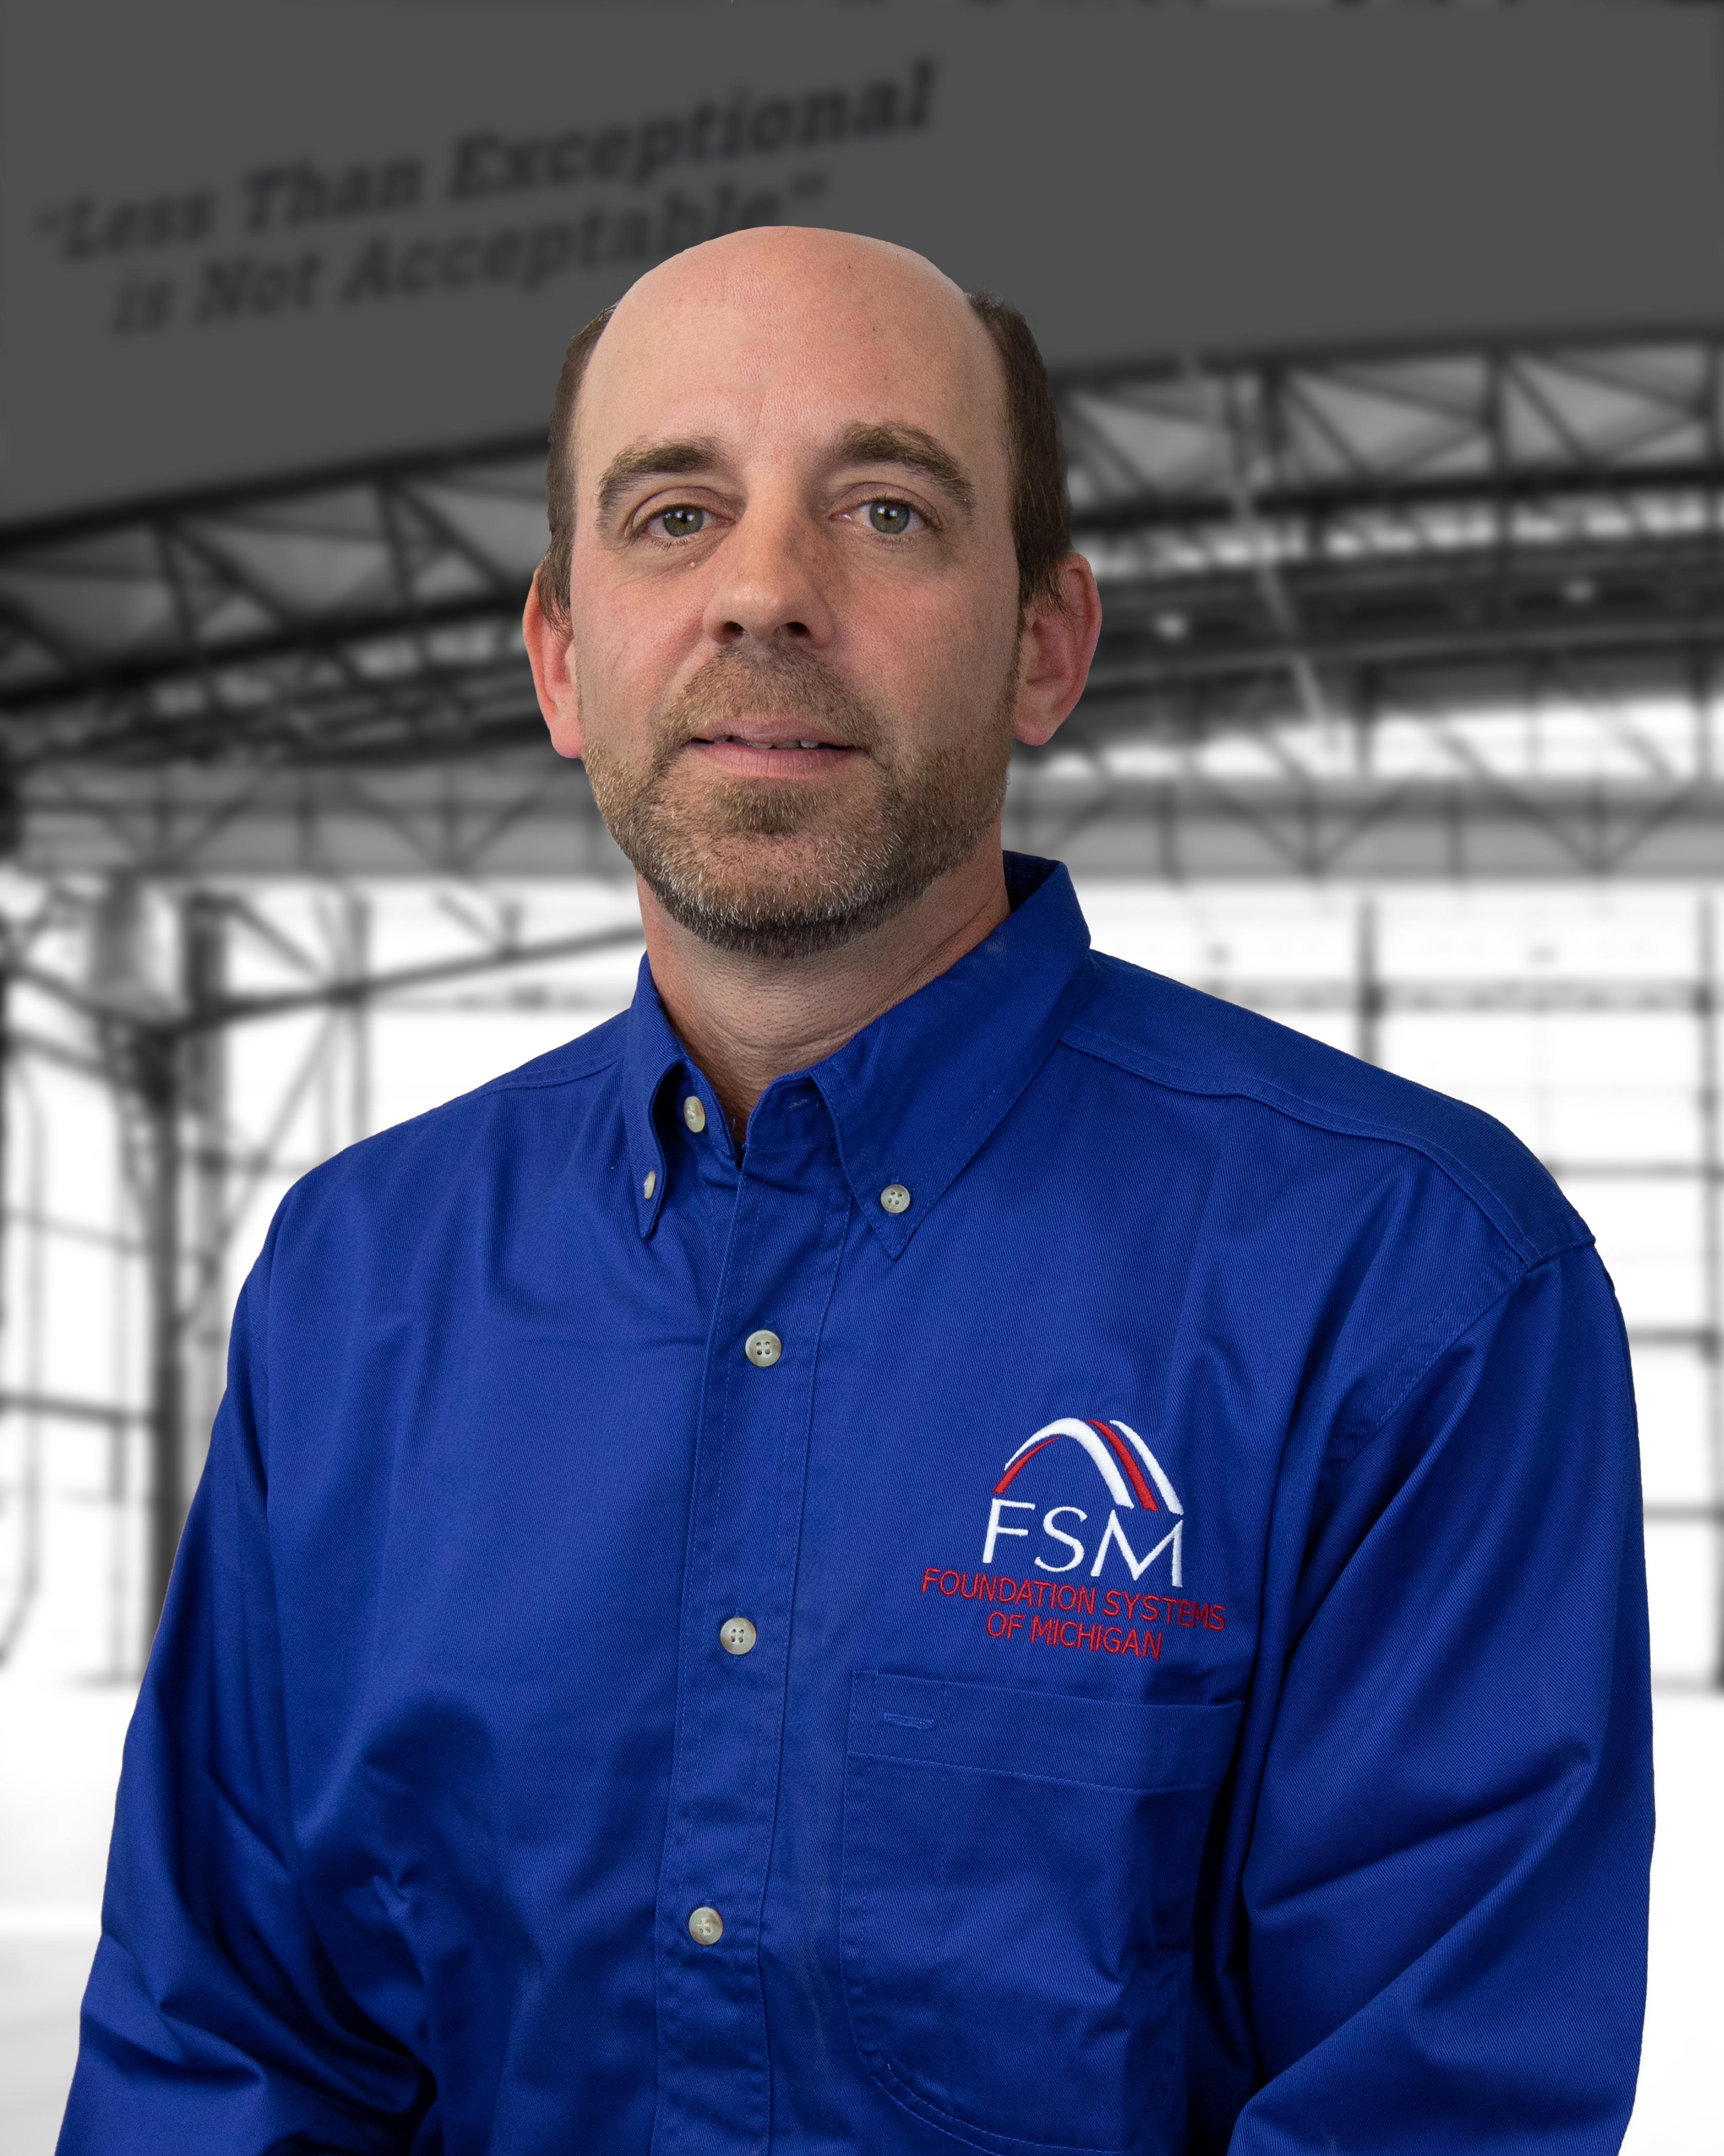 FSM Tod Calleja Foreman